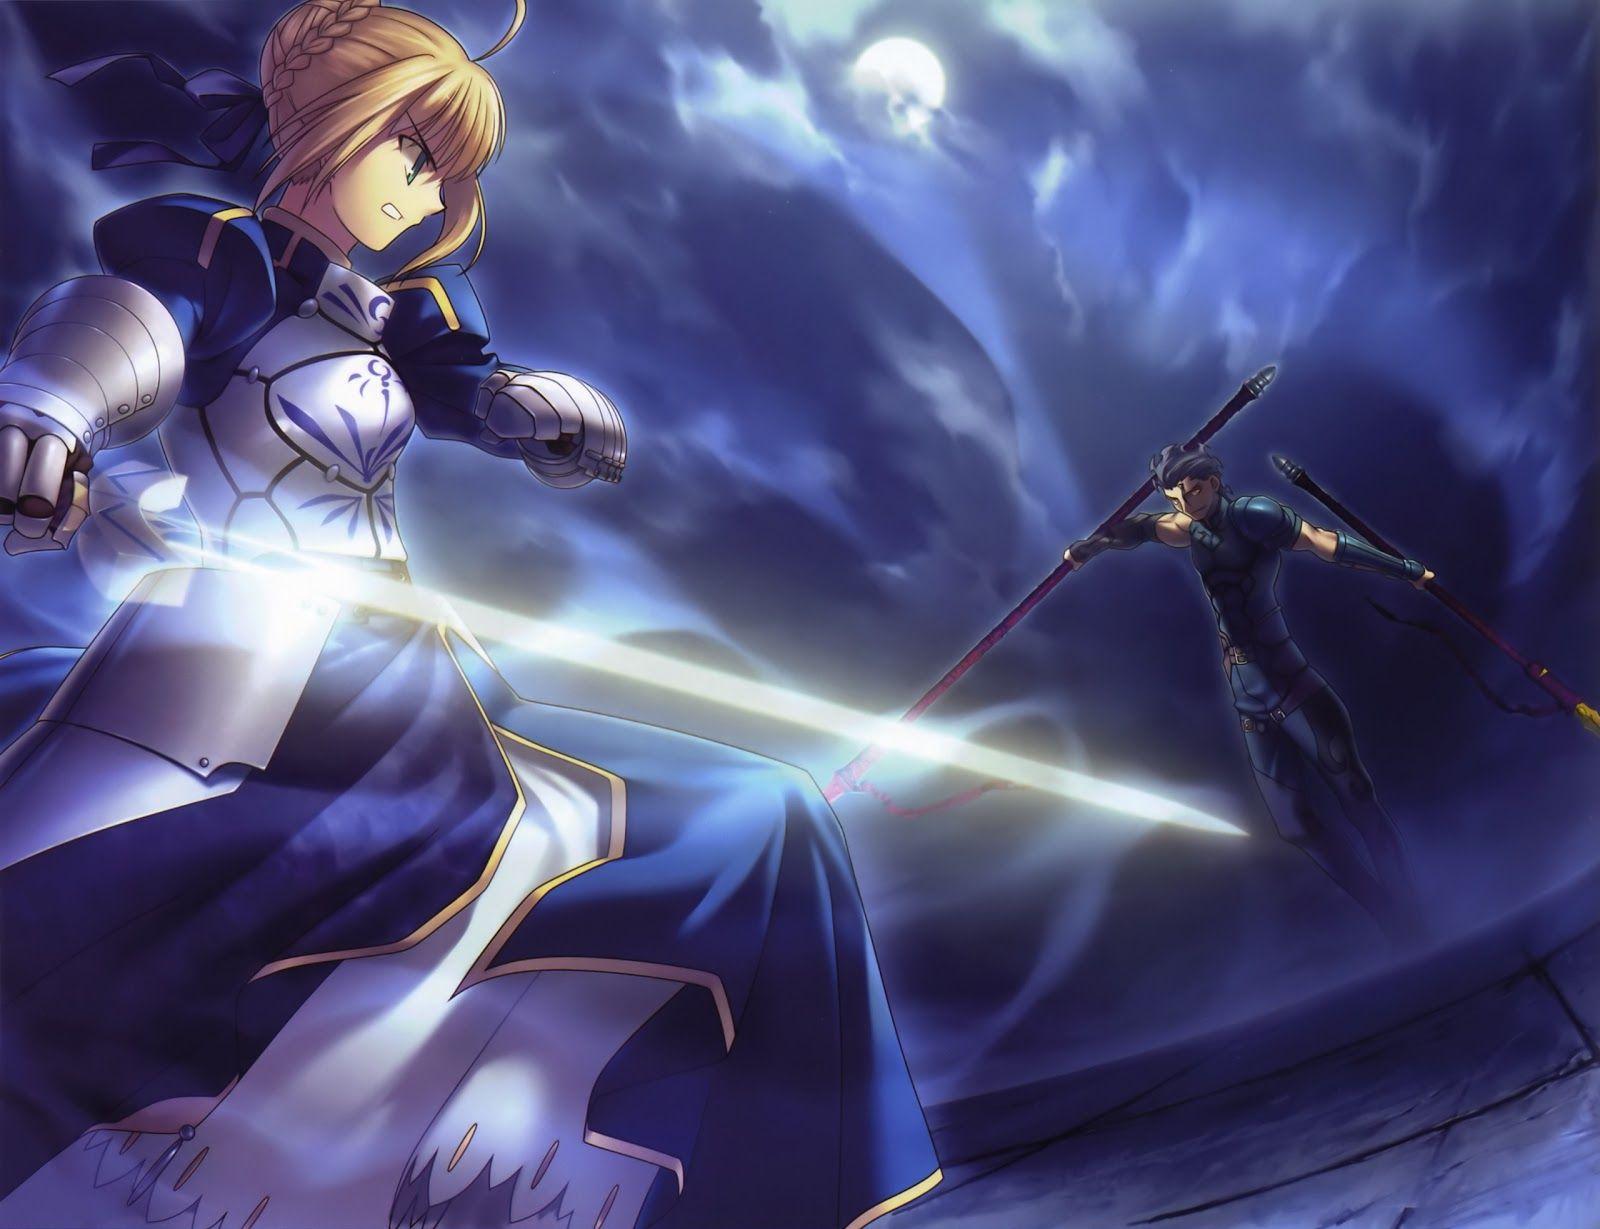 Bleach Anime Wallpapers Fate Zero HD Wallpaper